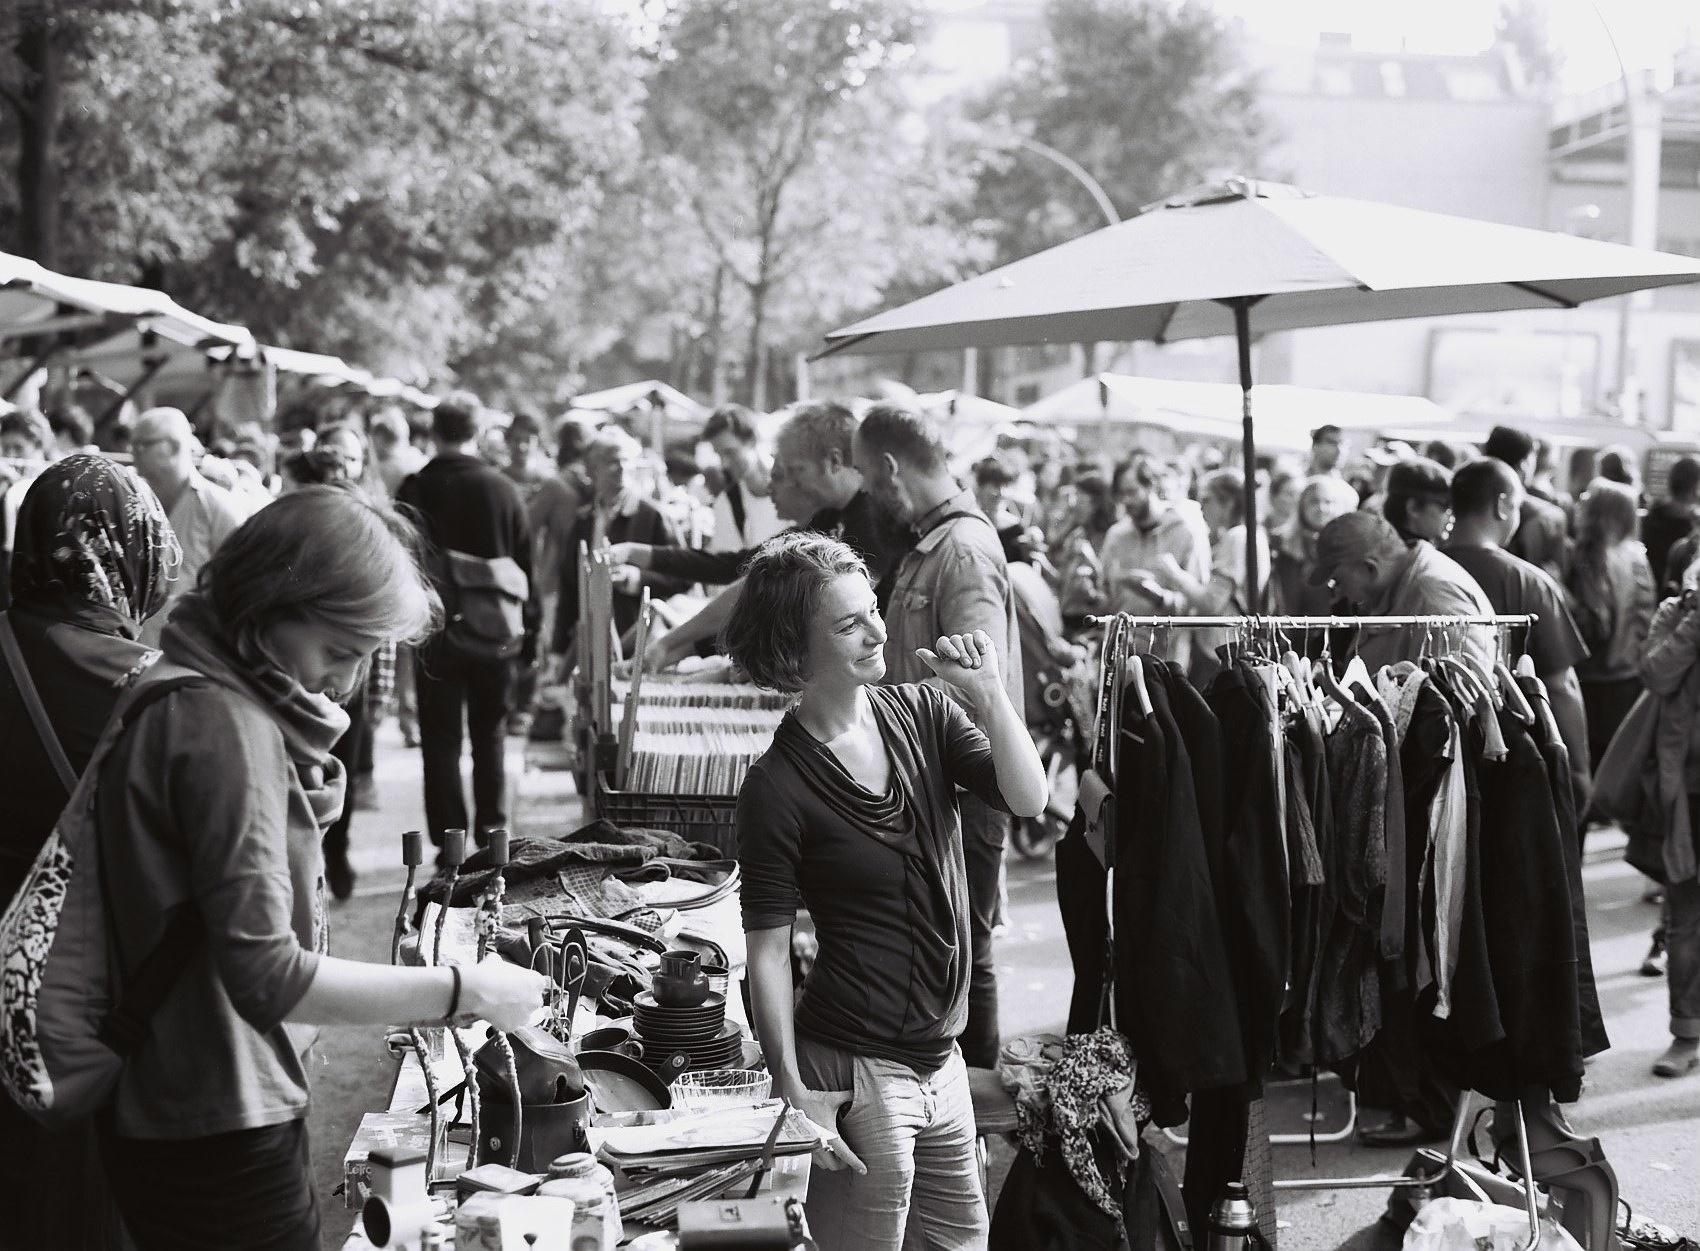 Trödelmarkt Berlin Neuköln by alfrededgar